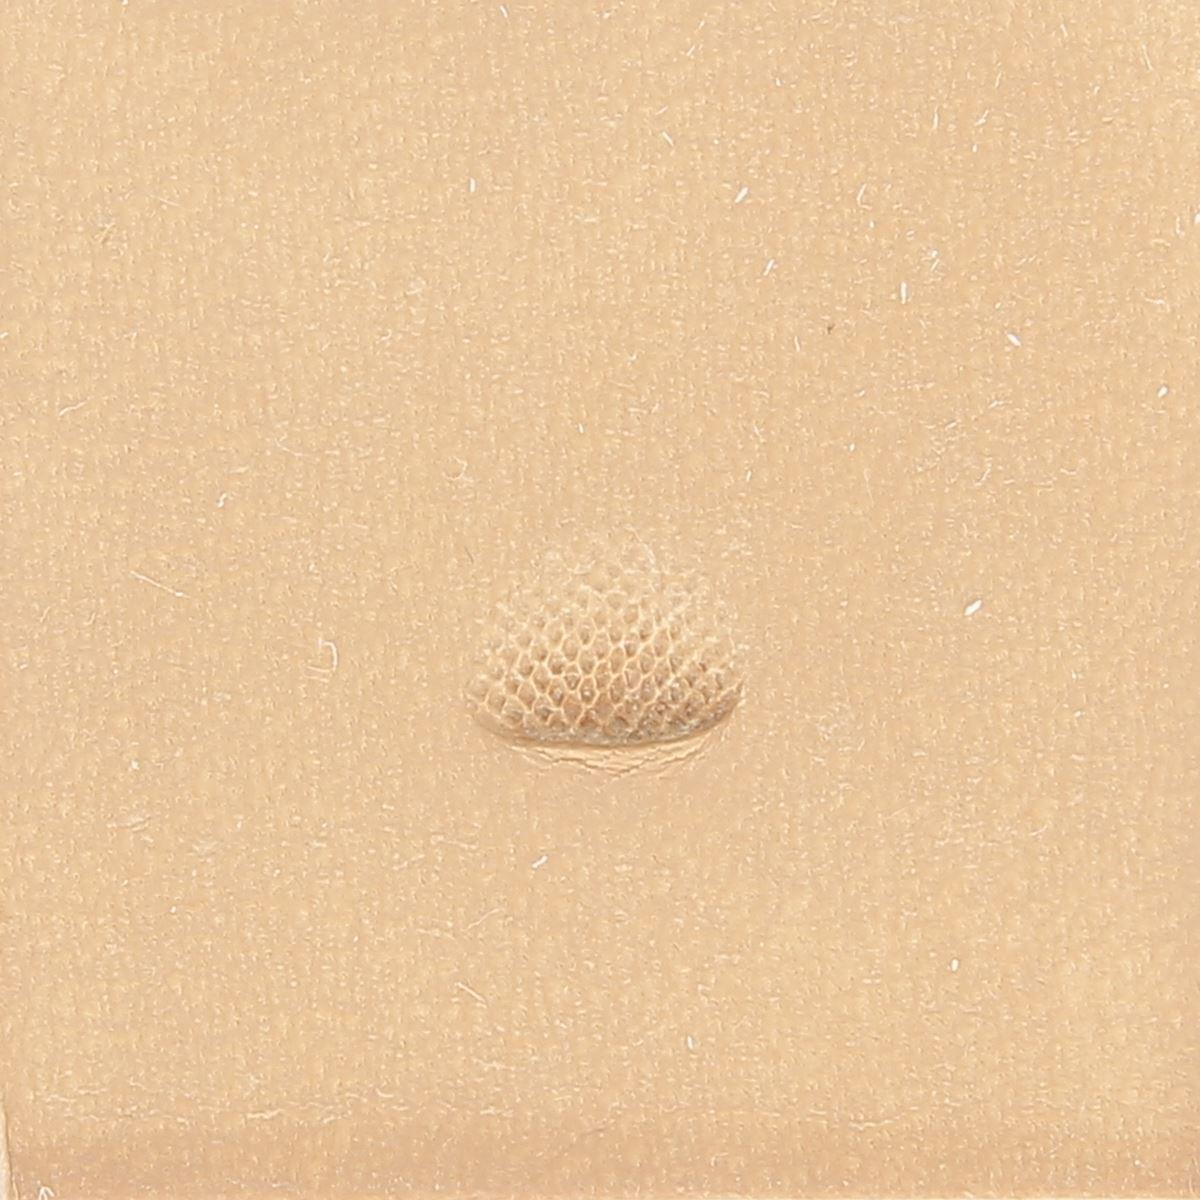 Matoir sur manche - Beveler gros quadrillage 9 mm - 6803 - B803